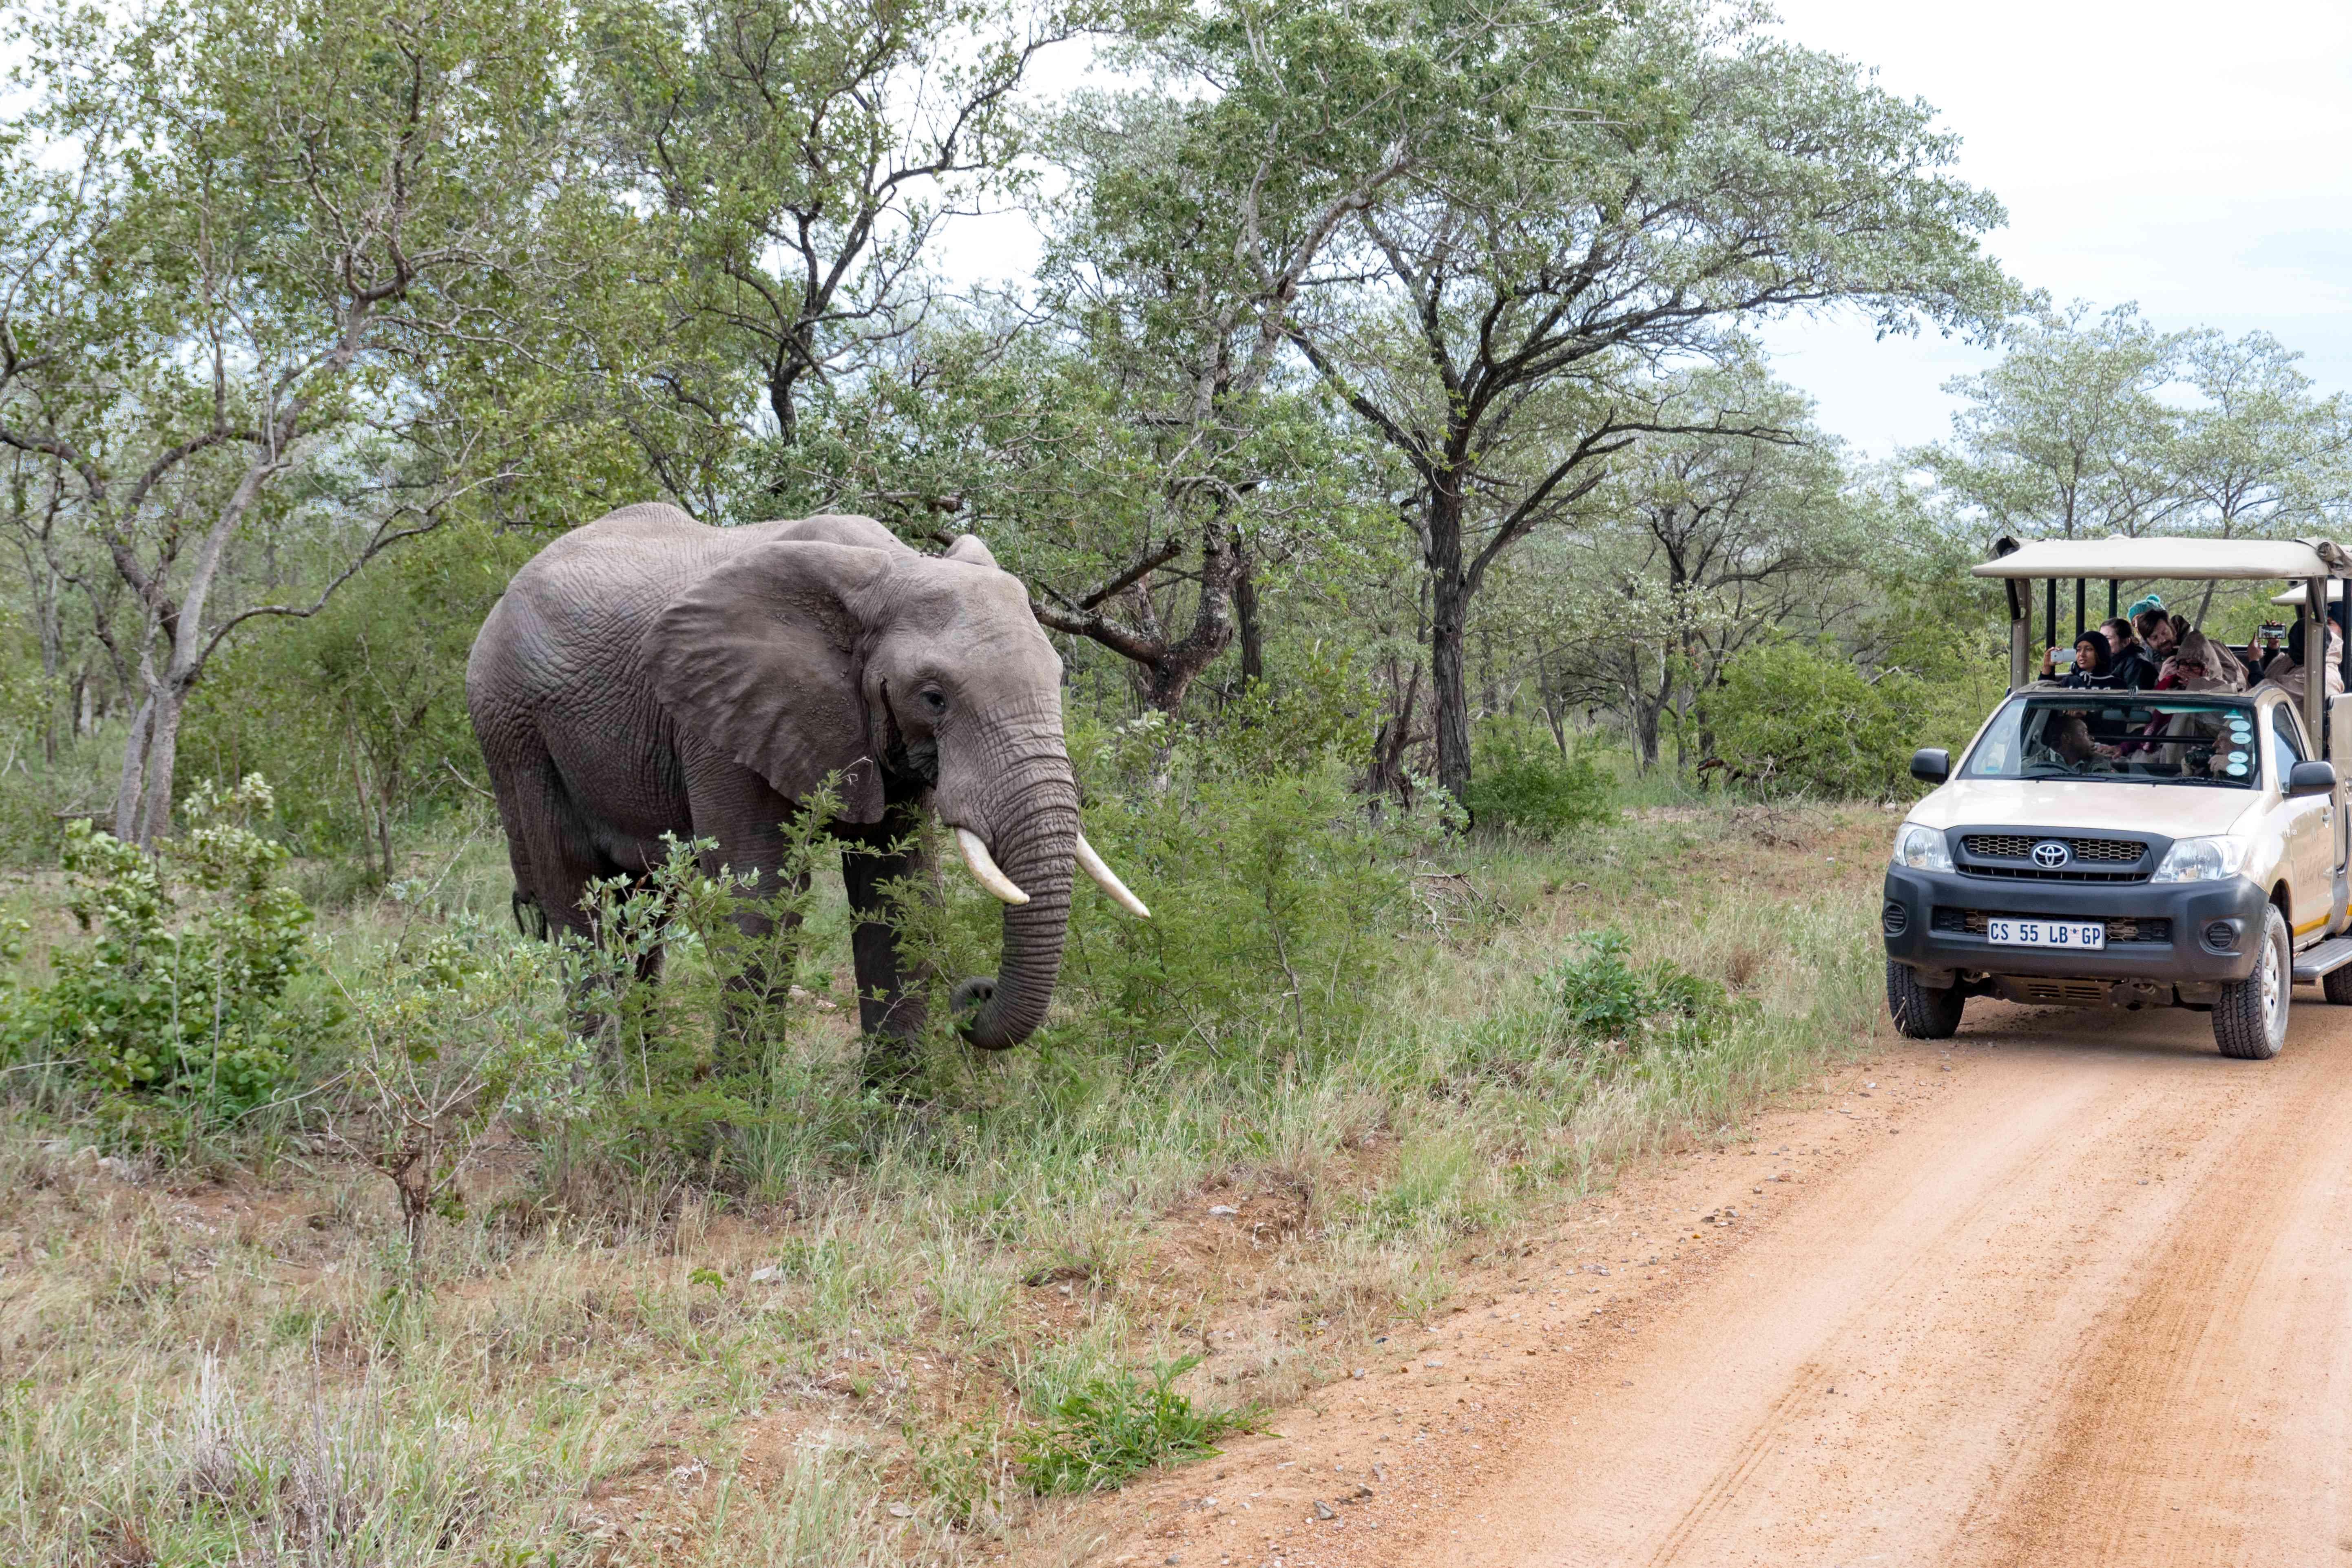 A tour group in Kruger National Park